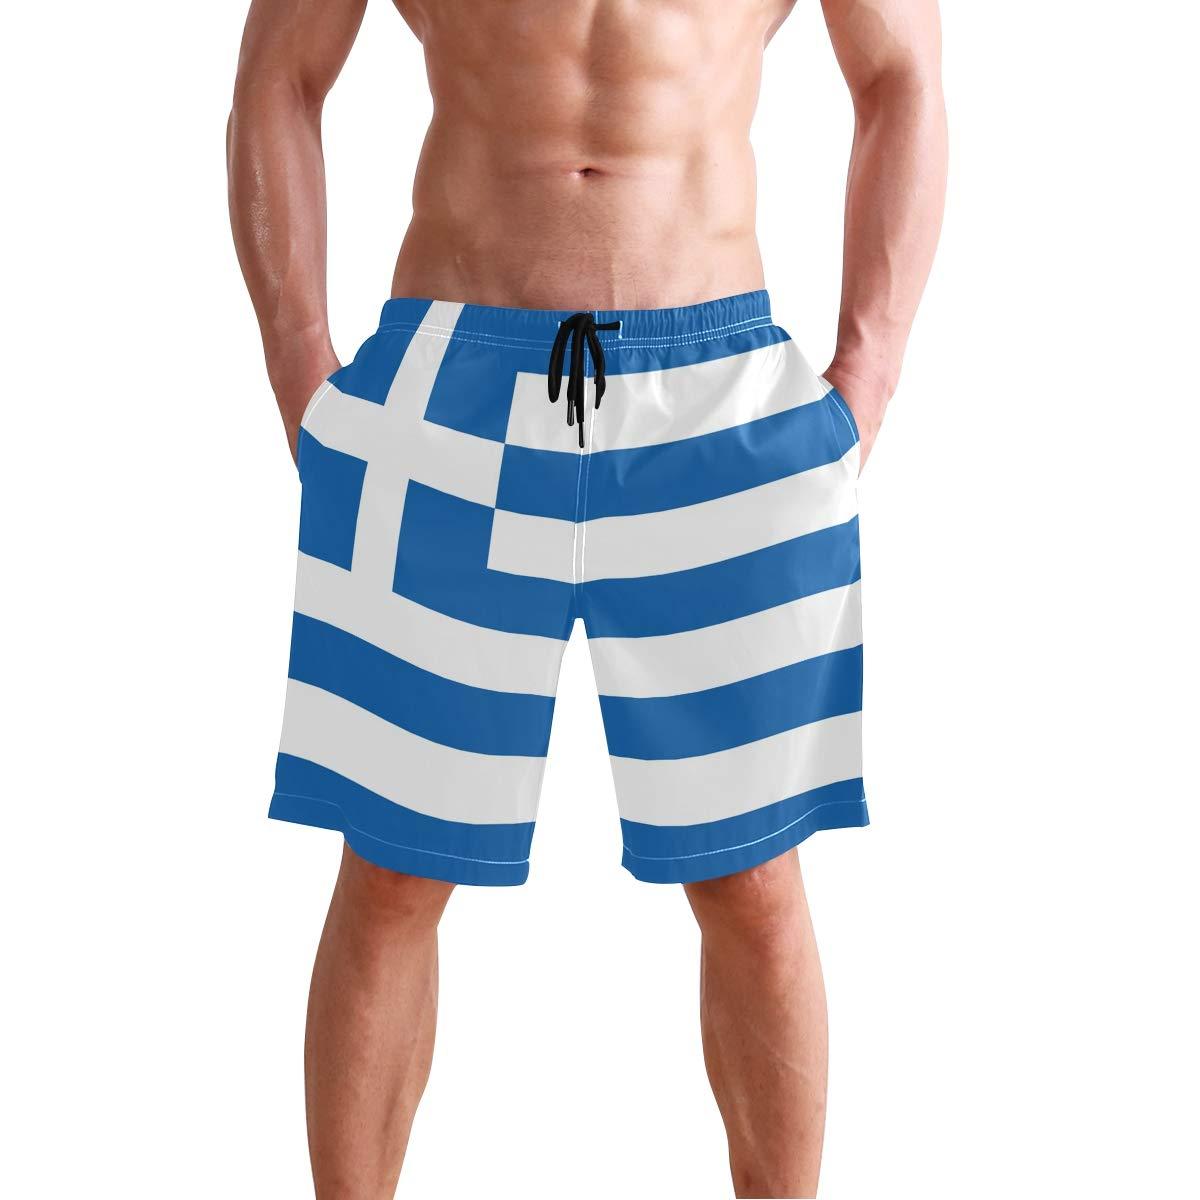 Chinein Mens Slim Fit Quick Dry Short Swim Trunks with Mesh Lining Greek Flag